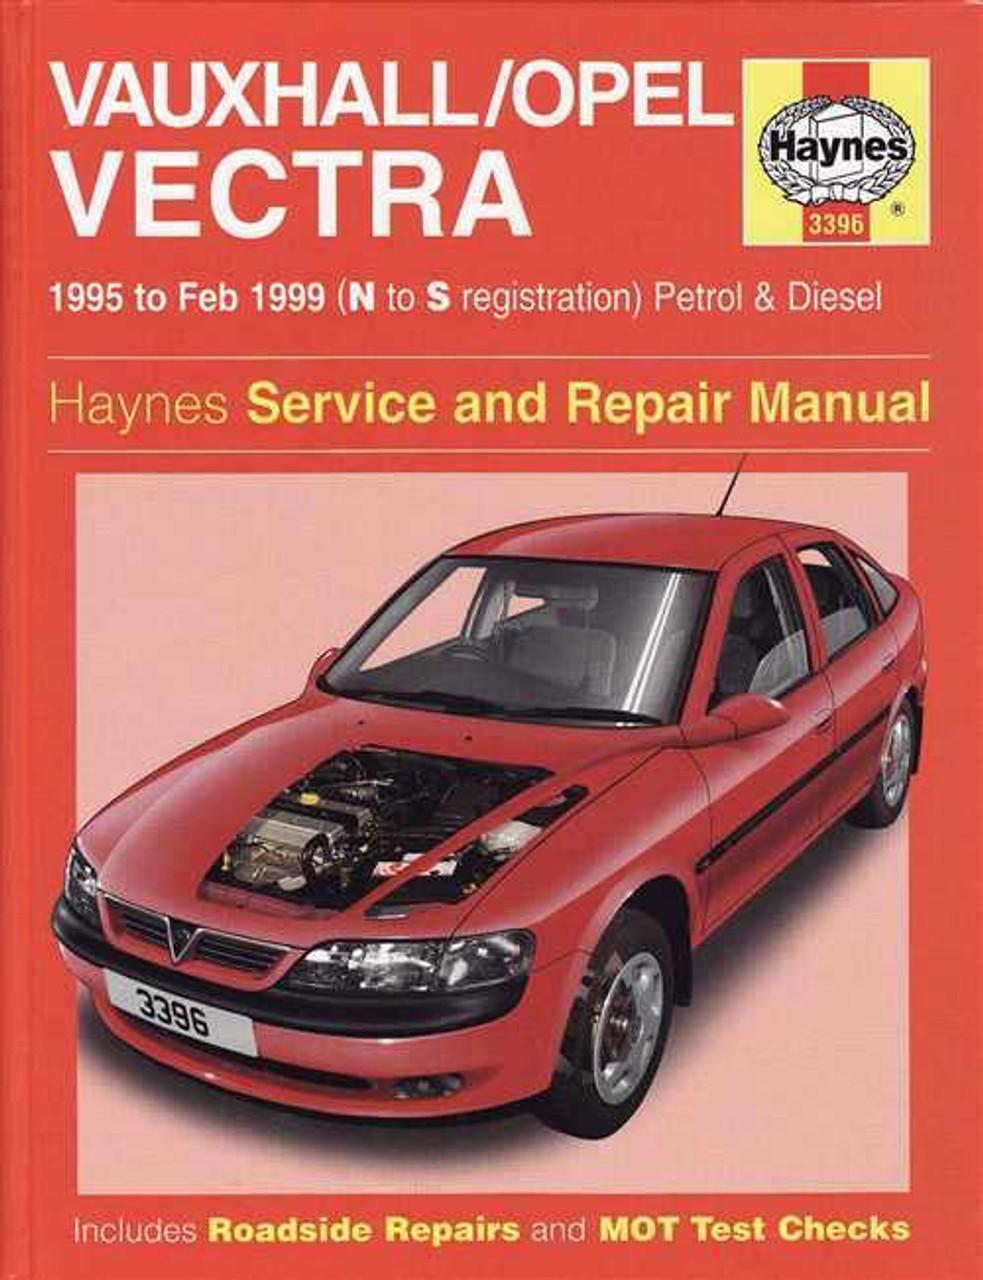 holden vectra 1995 1999 workshop manual rh automotobookshop com au Haynes Auto Repair Manuals Auto Repair Parts Manual